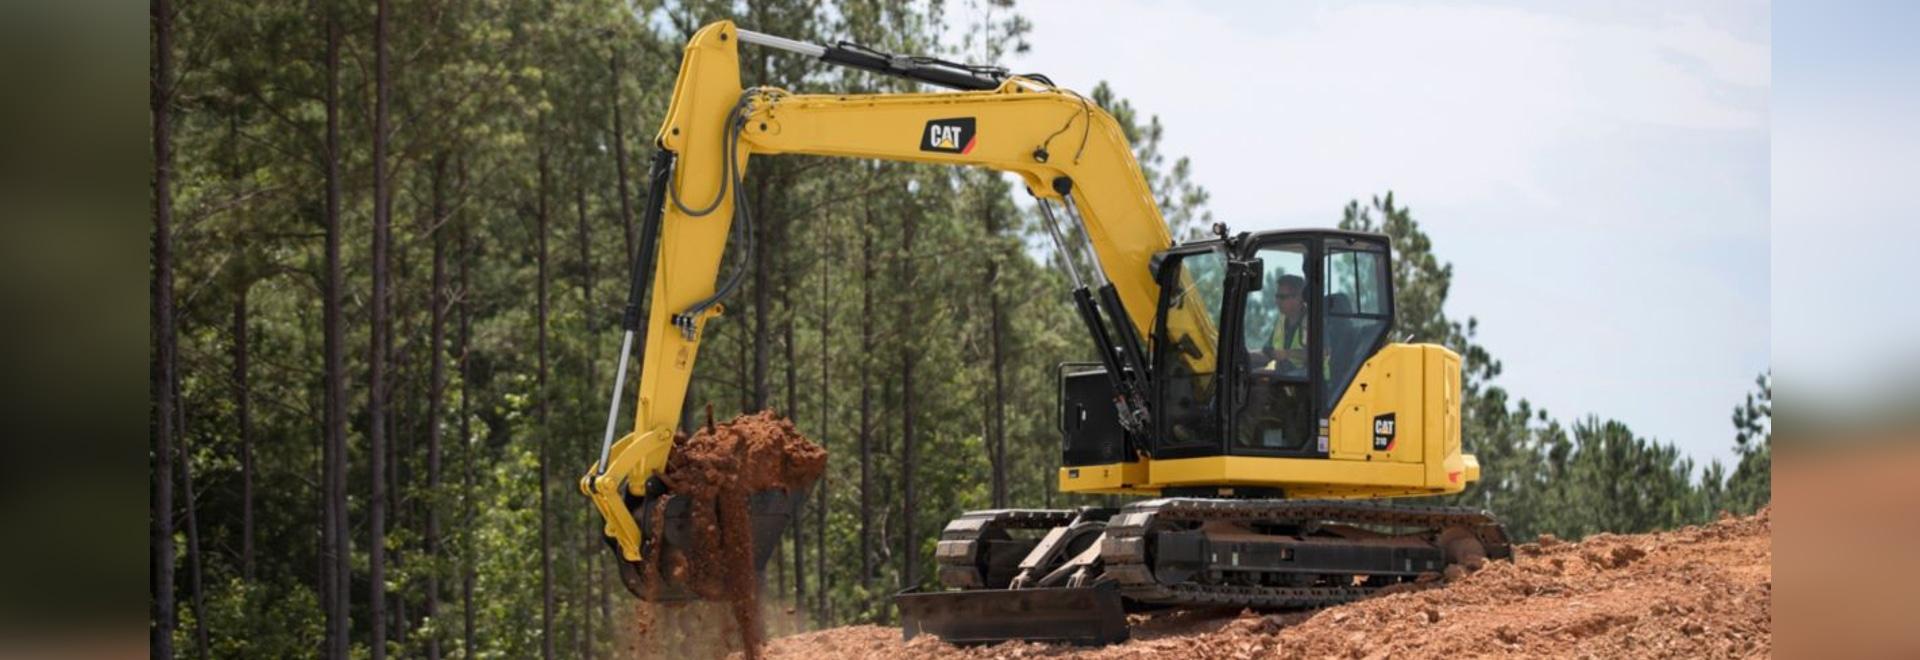 Caterpillar Next Generation 7- to 10-ton Excavators